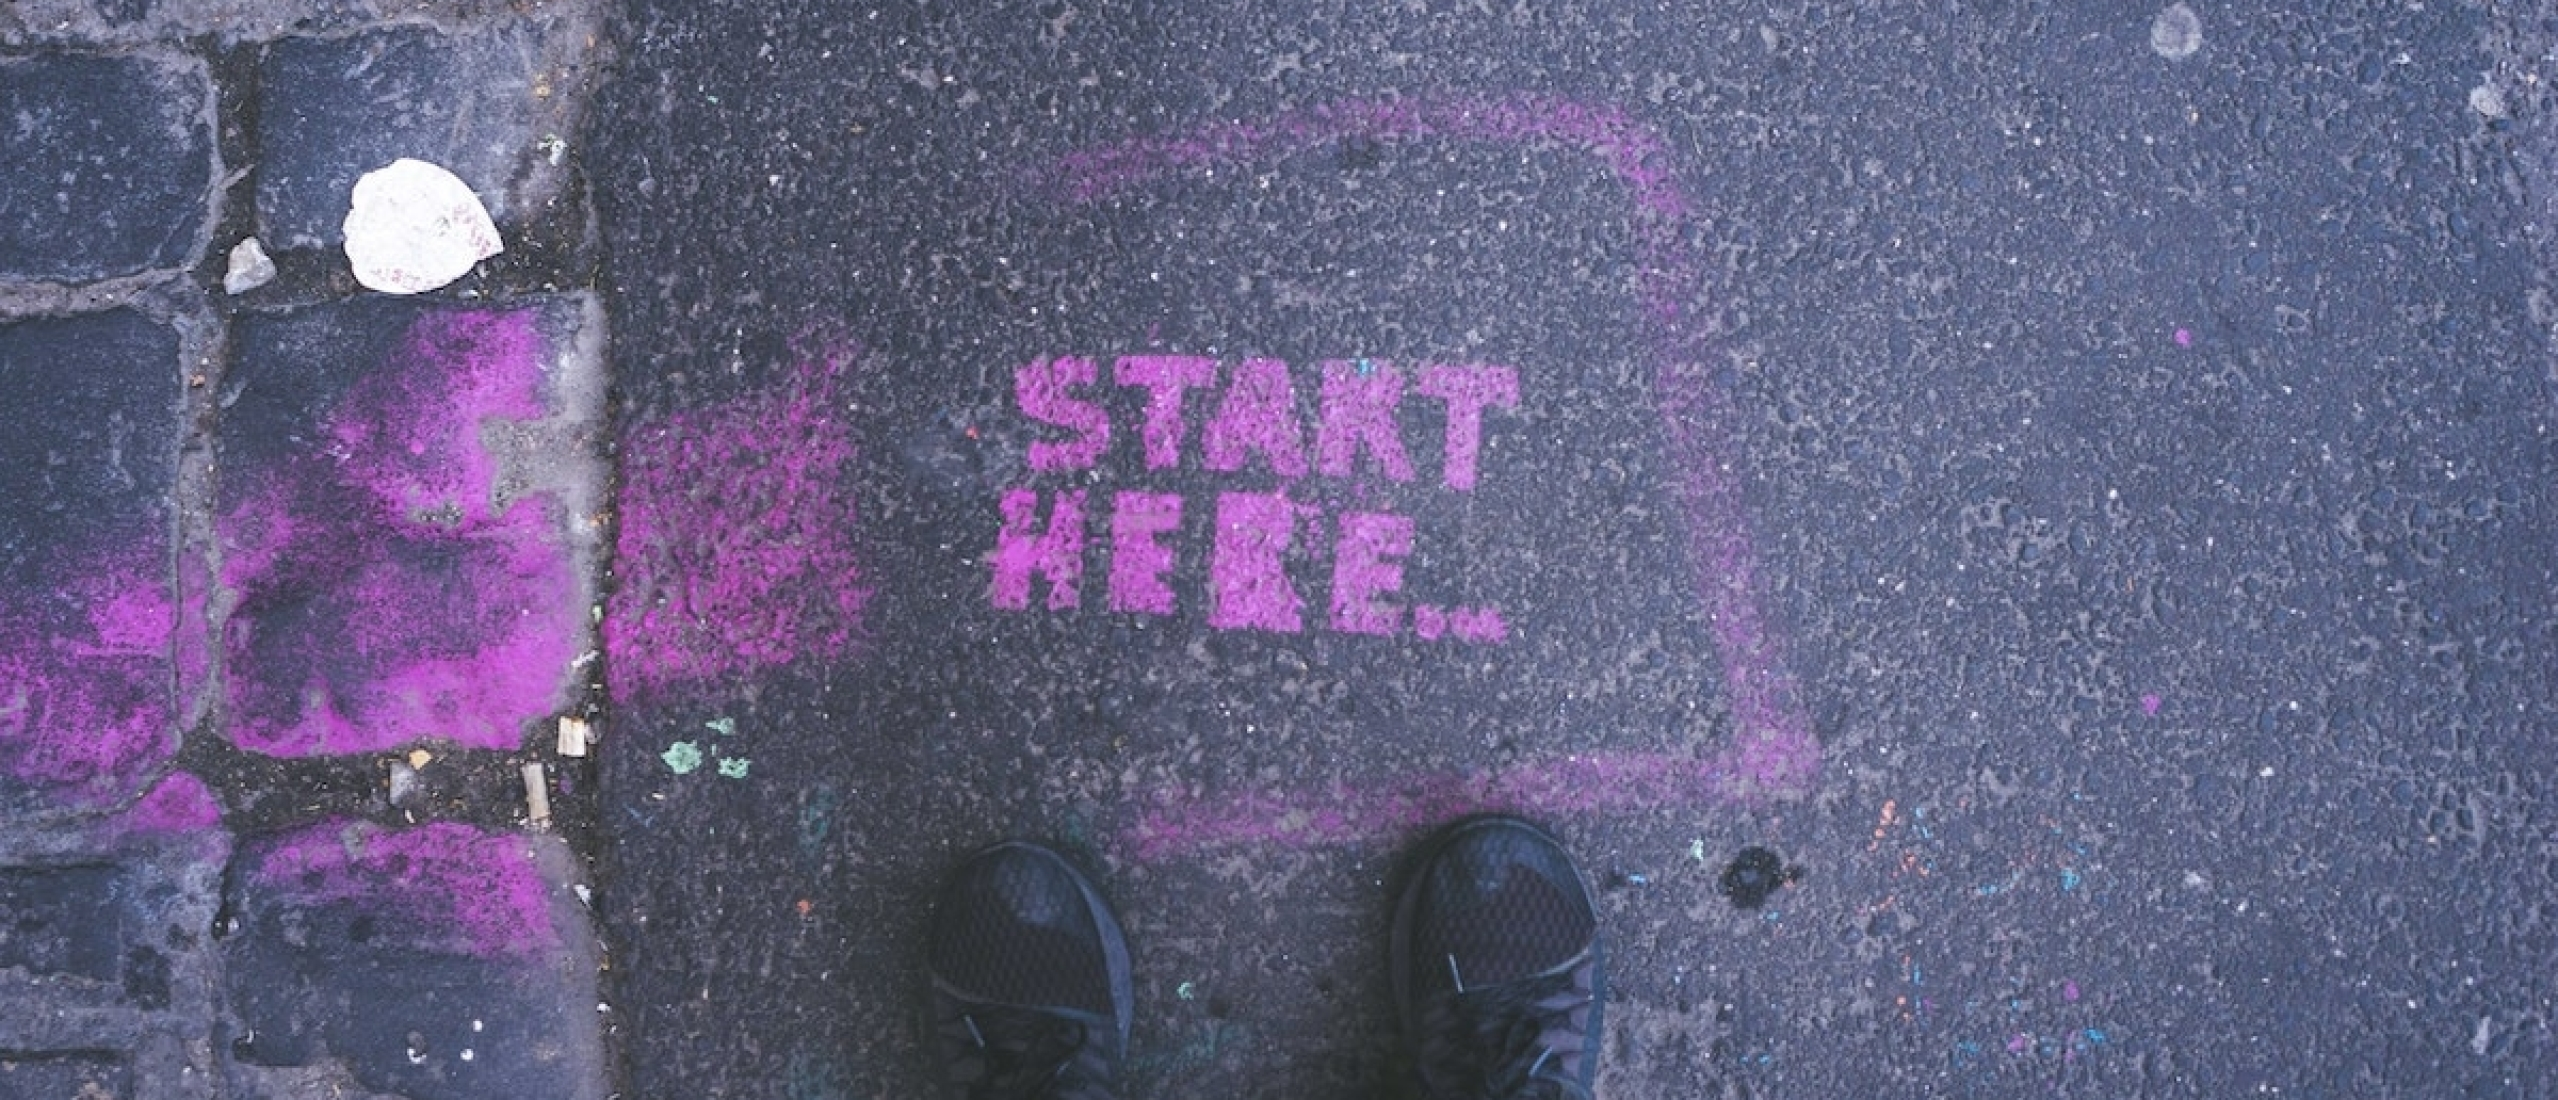 Je eerste week als ondernemer: wat ga je doen?